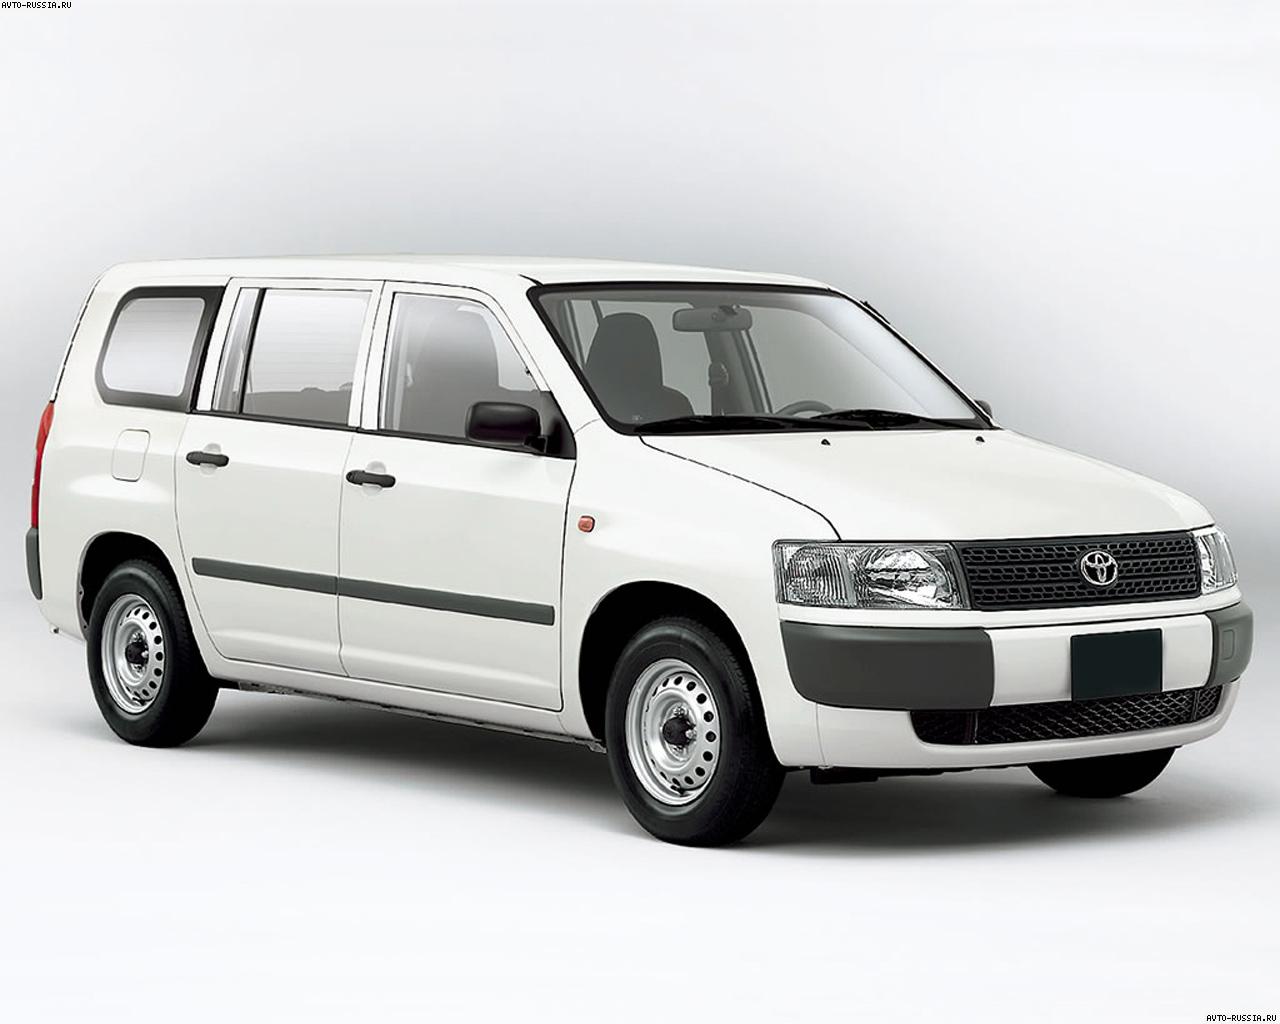 Toyota Probox 1280x1024 Jpg